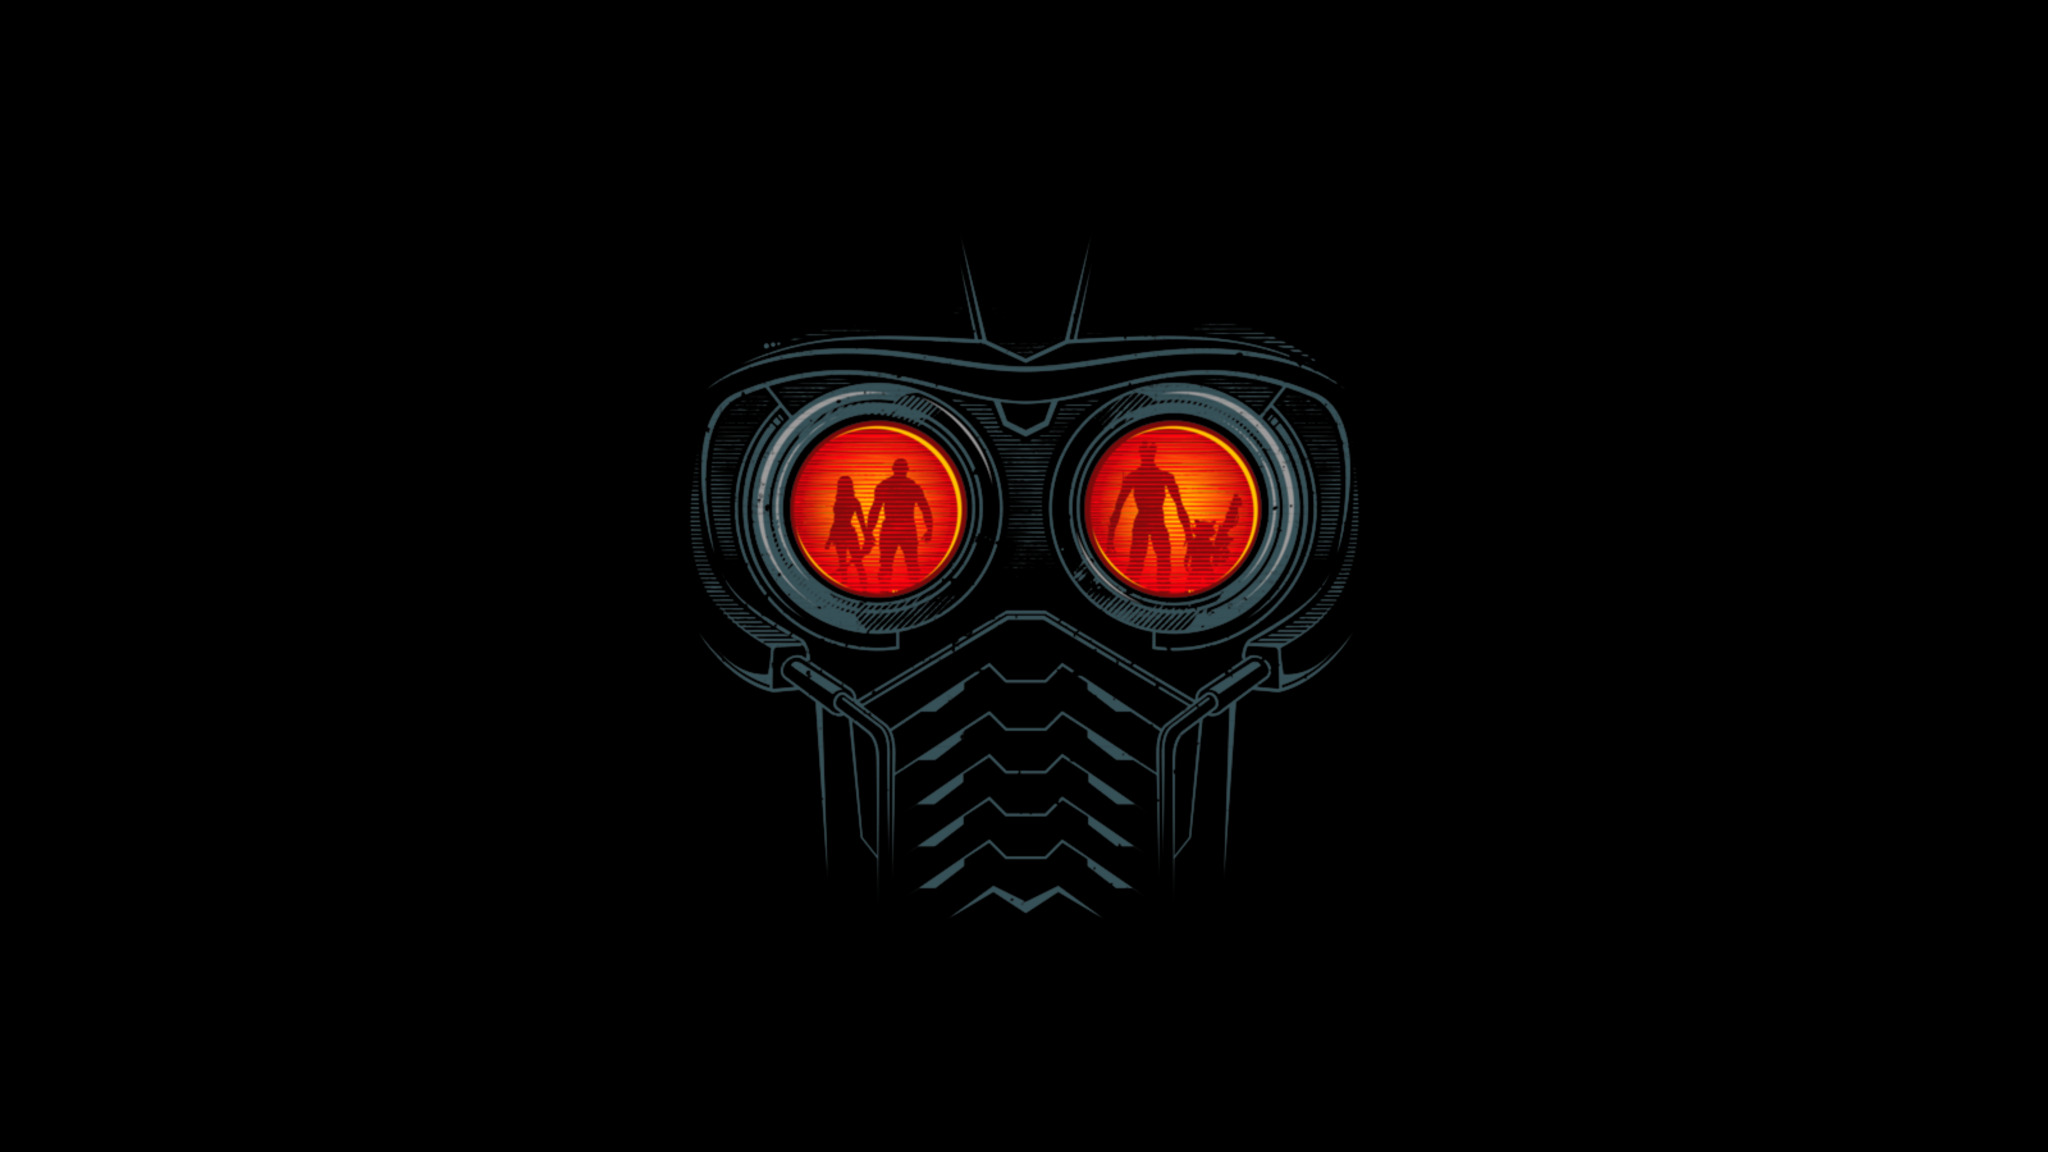 Guardians Of The Galaxy Star Lord Abstract Art 4k Hd: 2048x1152 Star Lord Mask 2048x1152 Resolution HD 4k